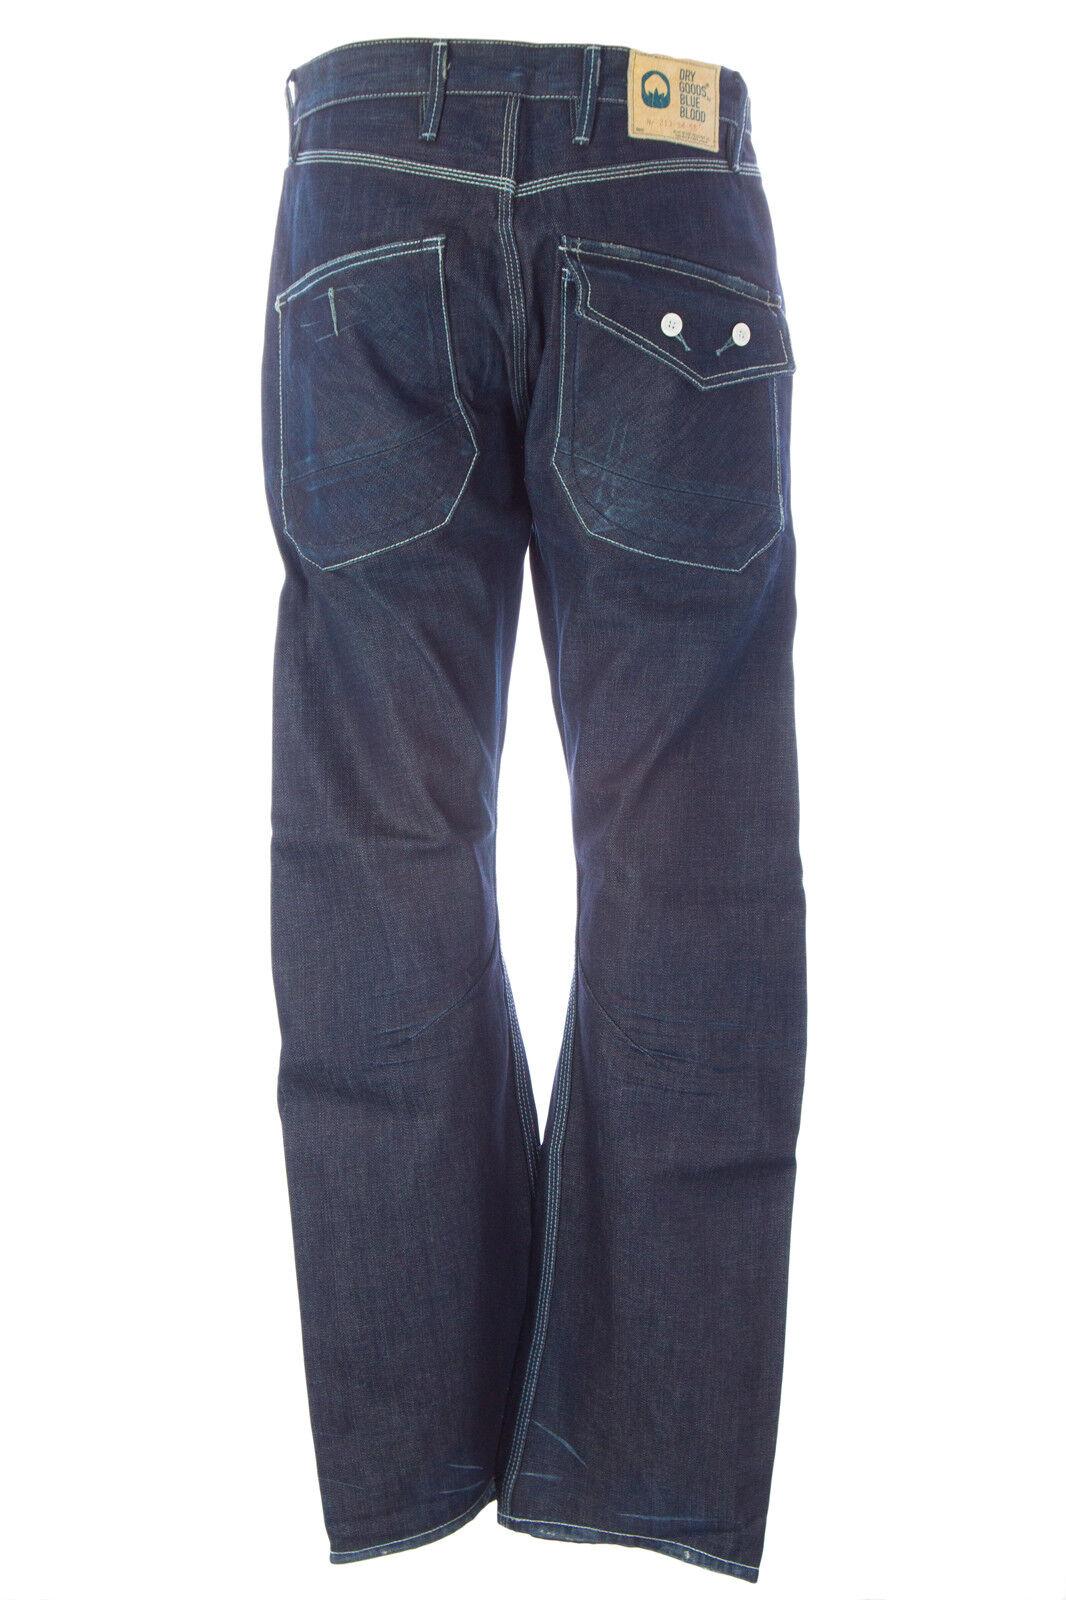 Blu Blu Blu Sangue Uomo Shoot C24 Jeans Tasca Bottone Jeans Mdgw0616 Nuova con Etichetta 21fc42